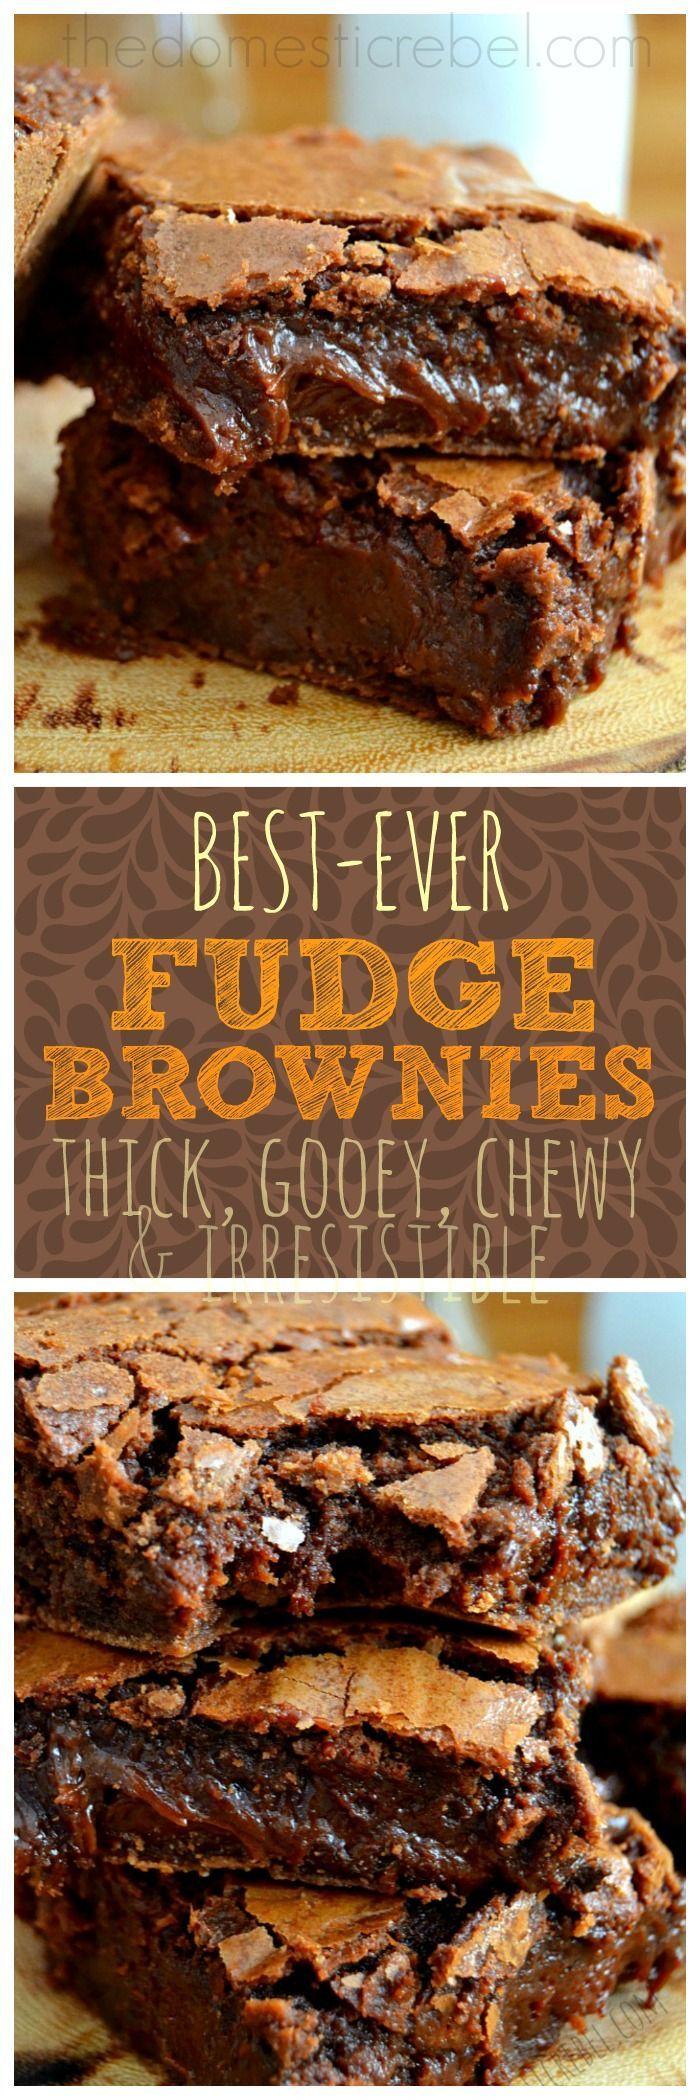 recipe: gooey chocolate fudge brownie recipe [38]